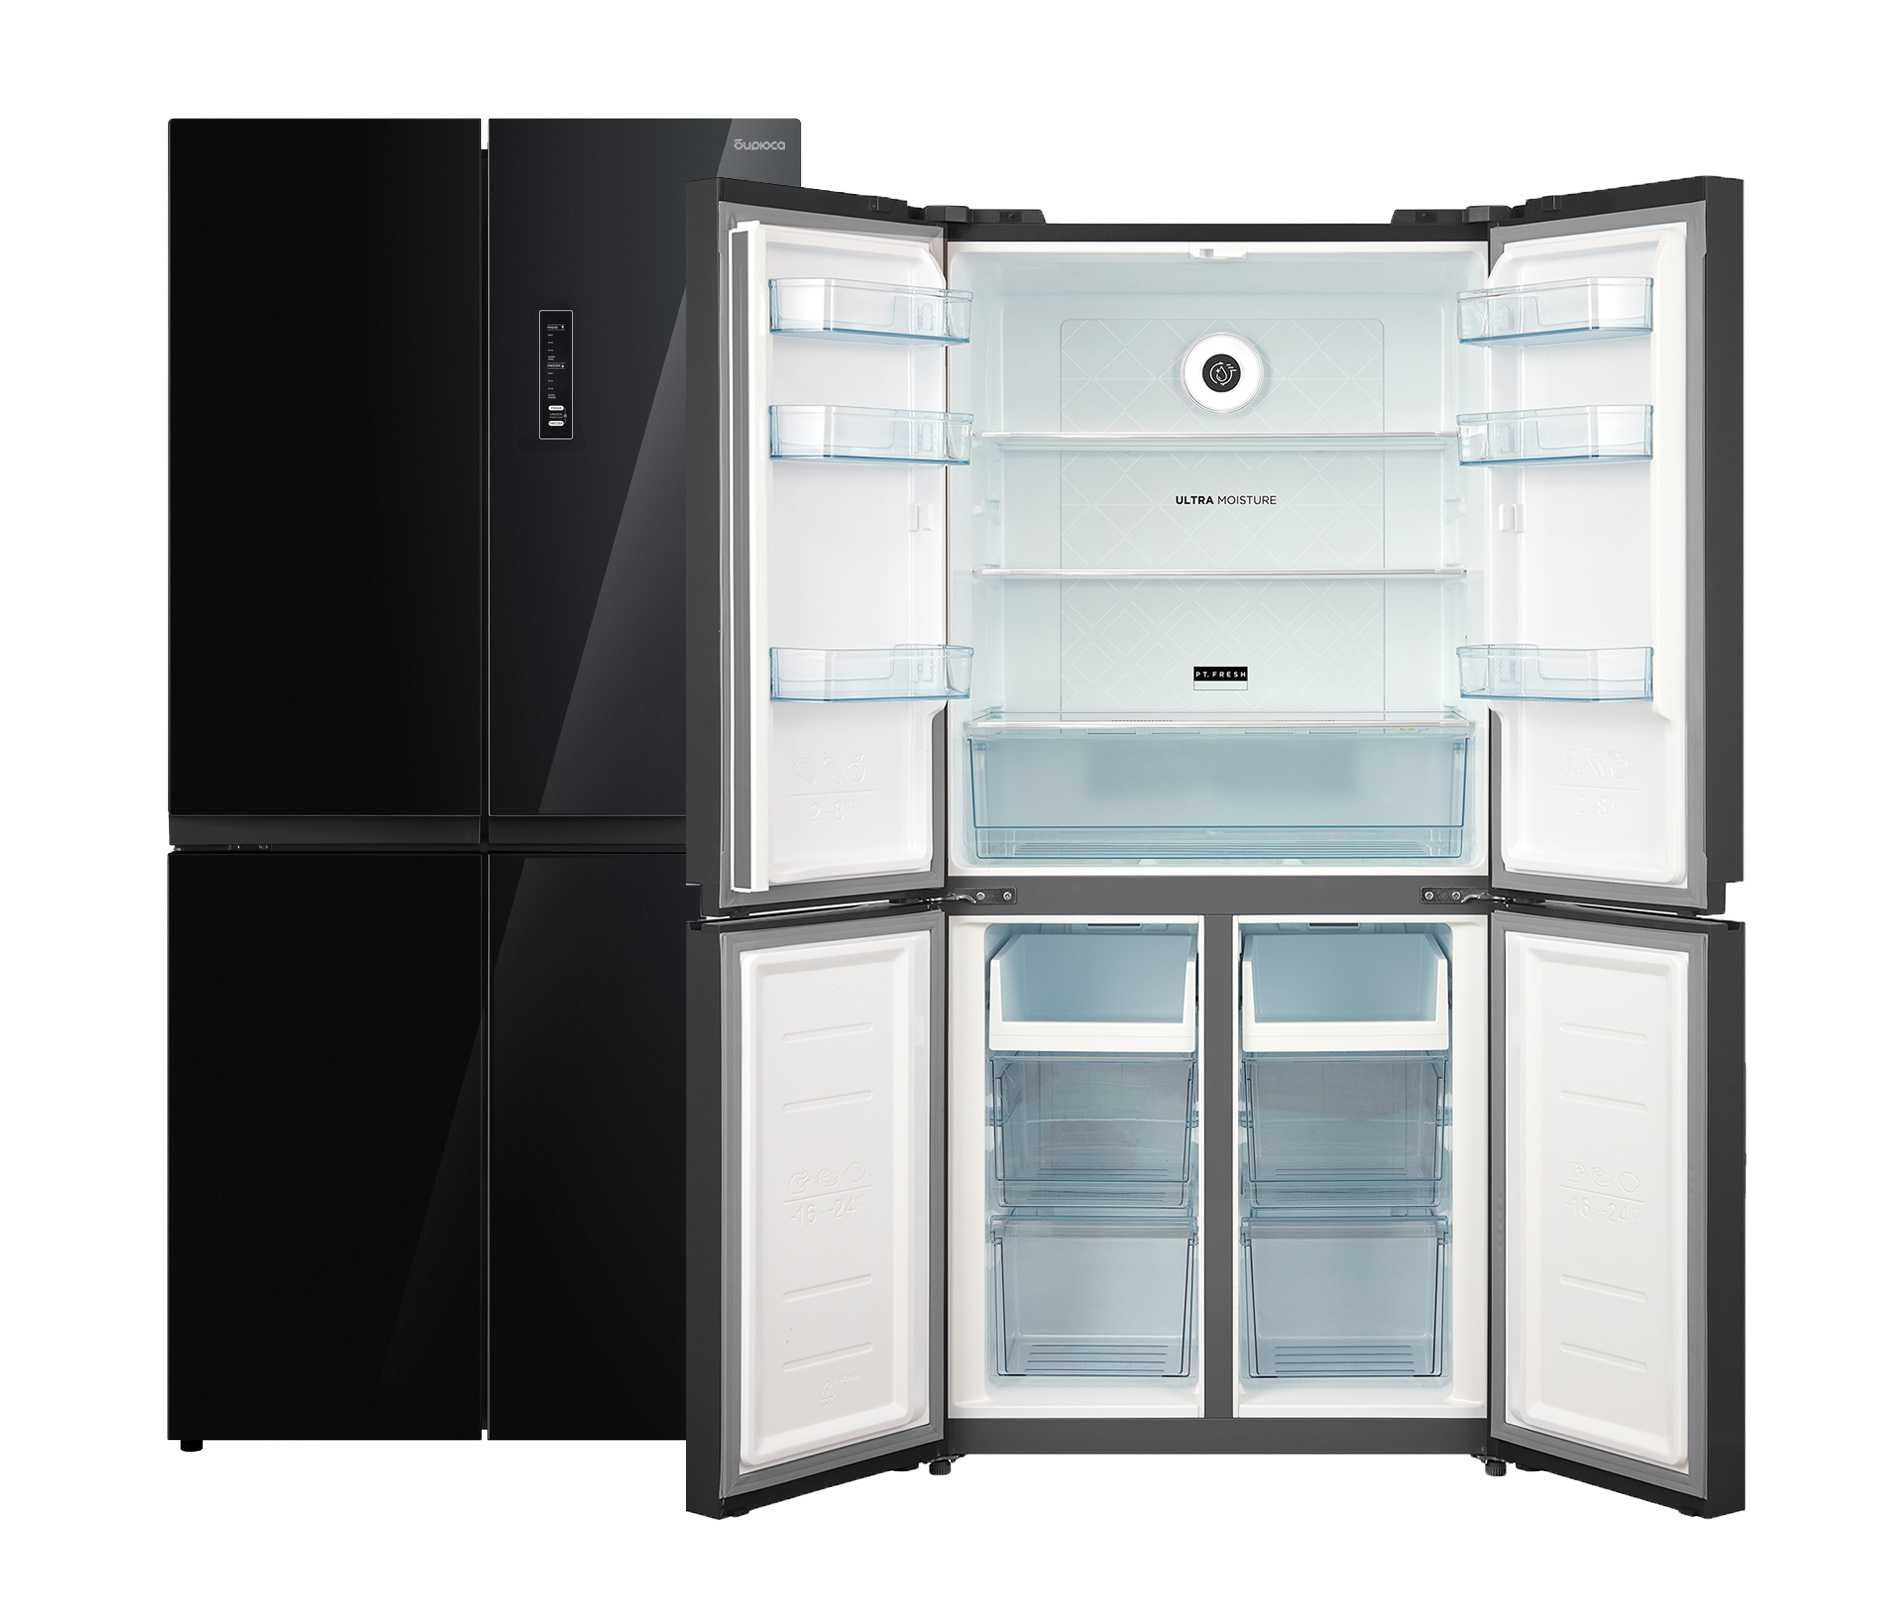 Холодильник side by side на 456 л по оптовой цене со склада.